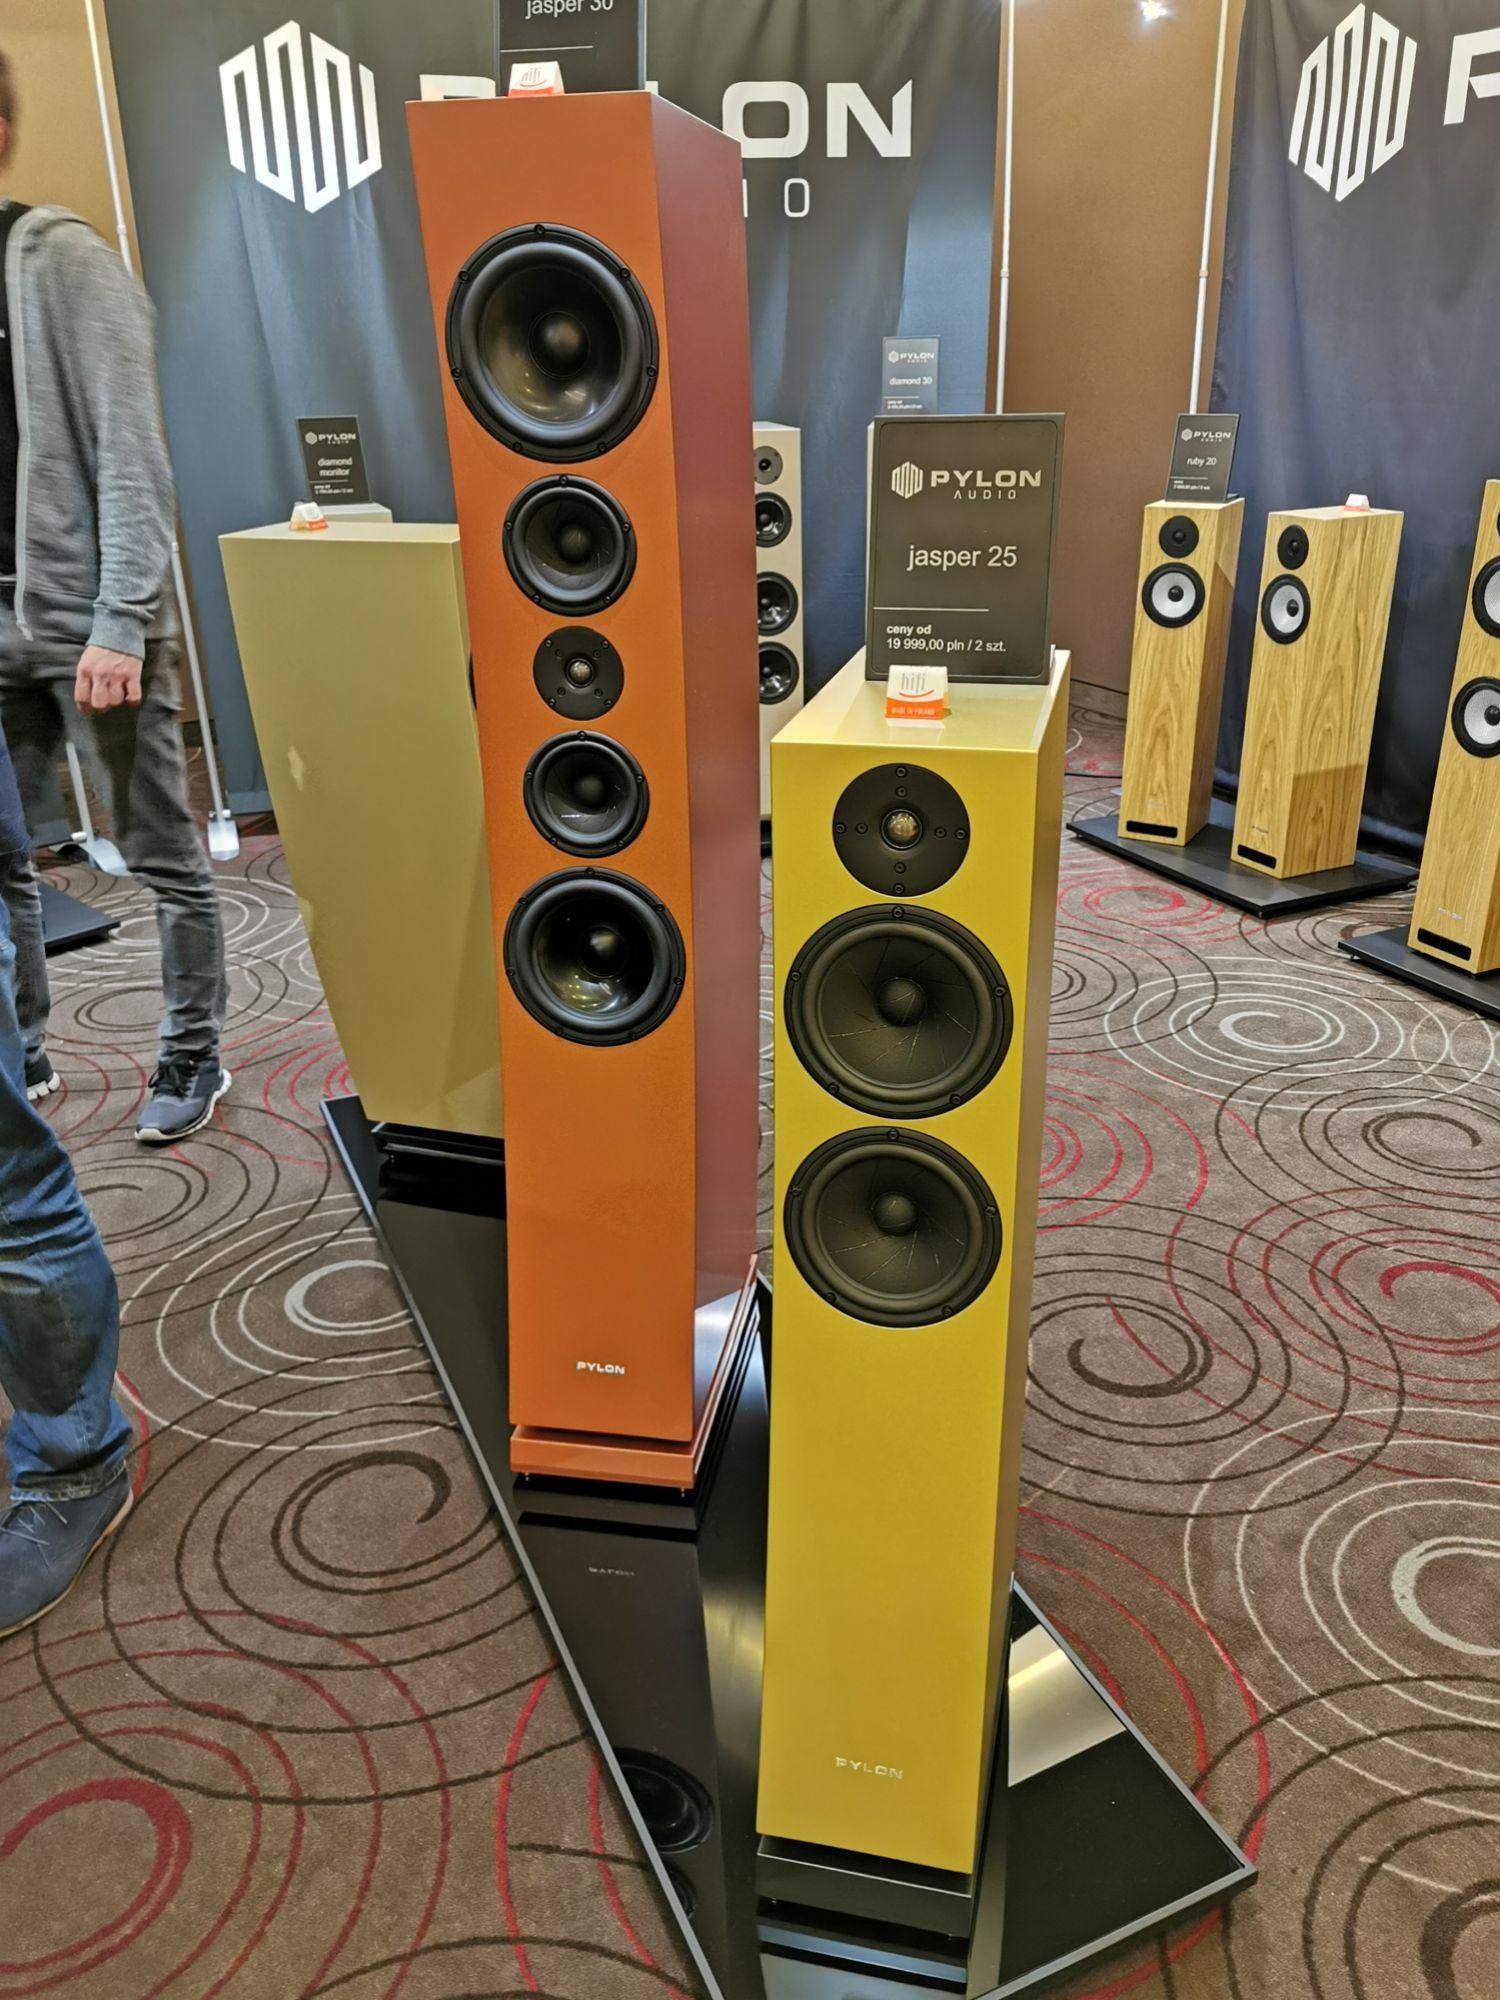 loa pylon audio jasper 30 hay